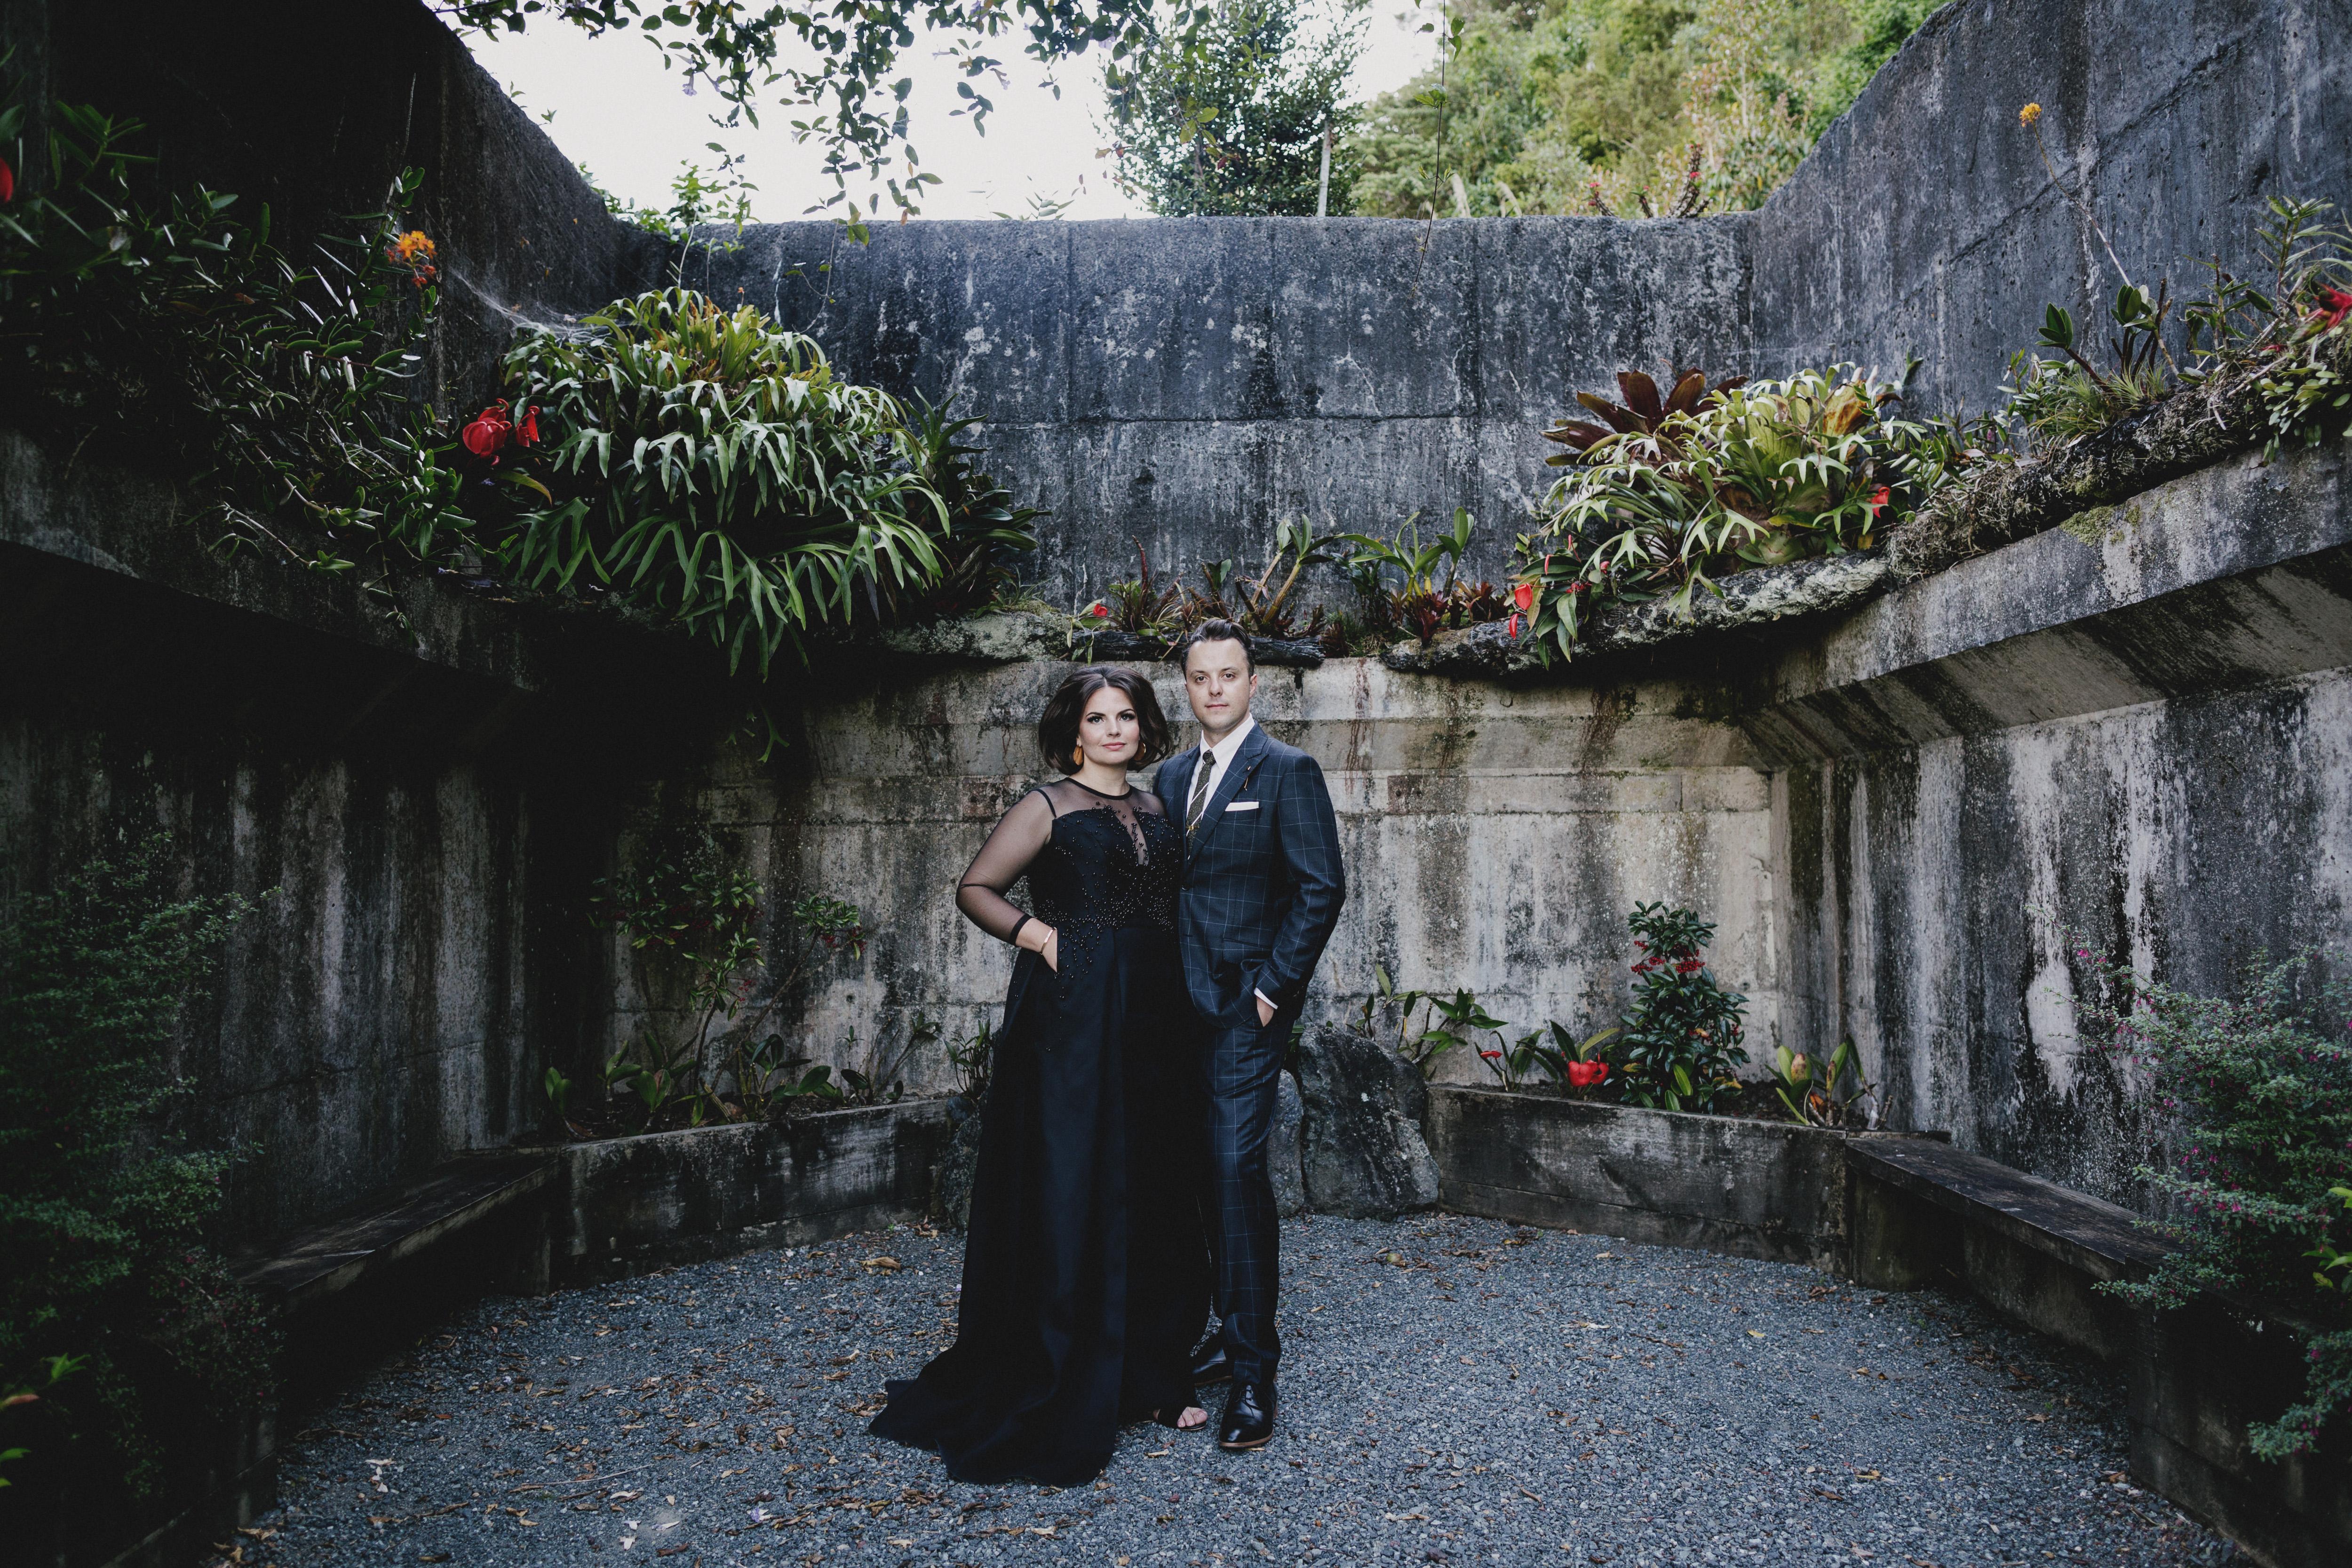 Categories: Weddings-Real Wedding: Bonny + Kyle - Photography by Kate MacPherson & Jo Wickham